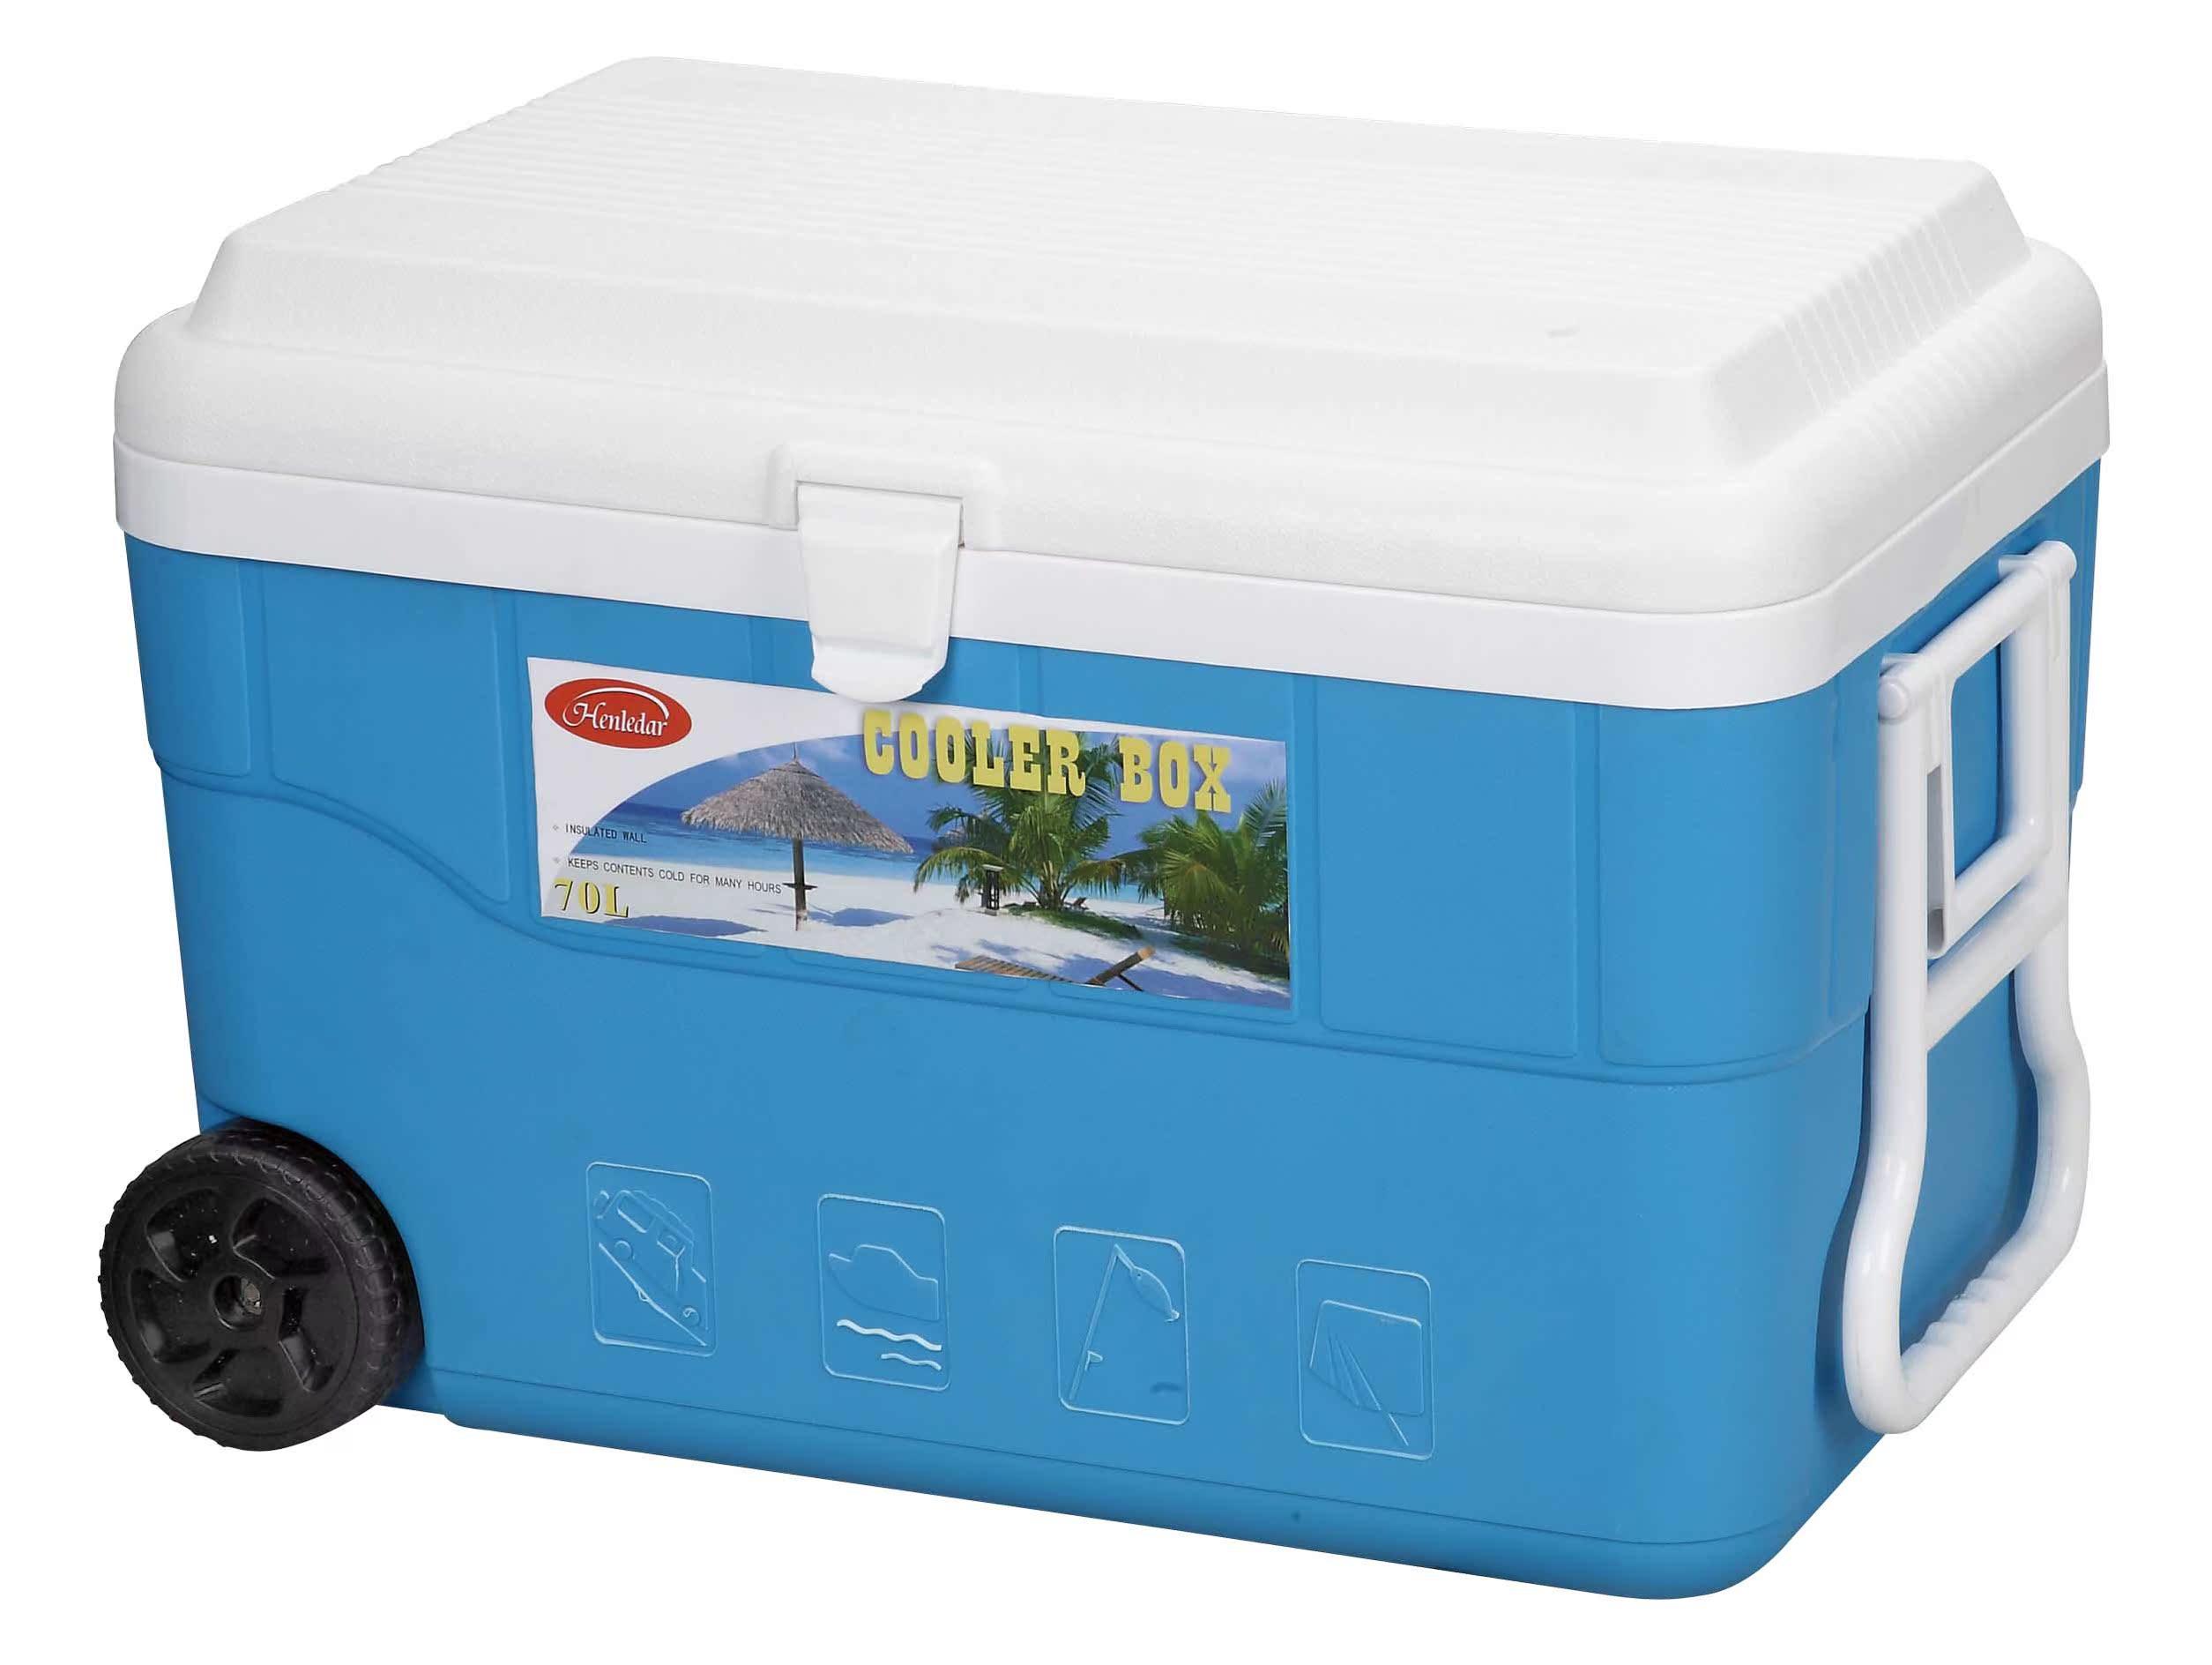 70/80L升超大PU保温箱保热 快餐外卖保温箱 海鲜运输箱冷藏周转箱